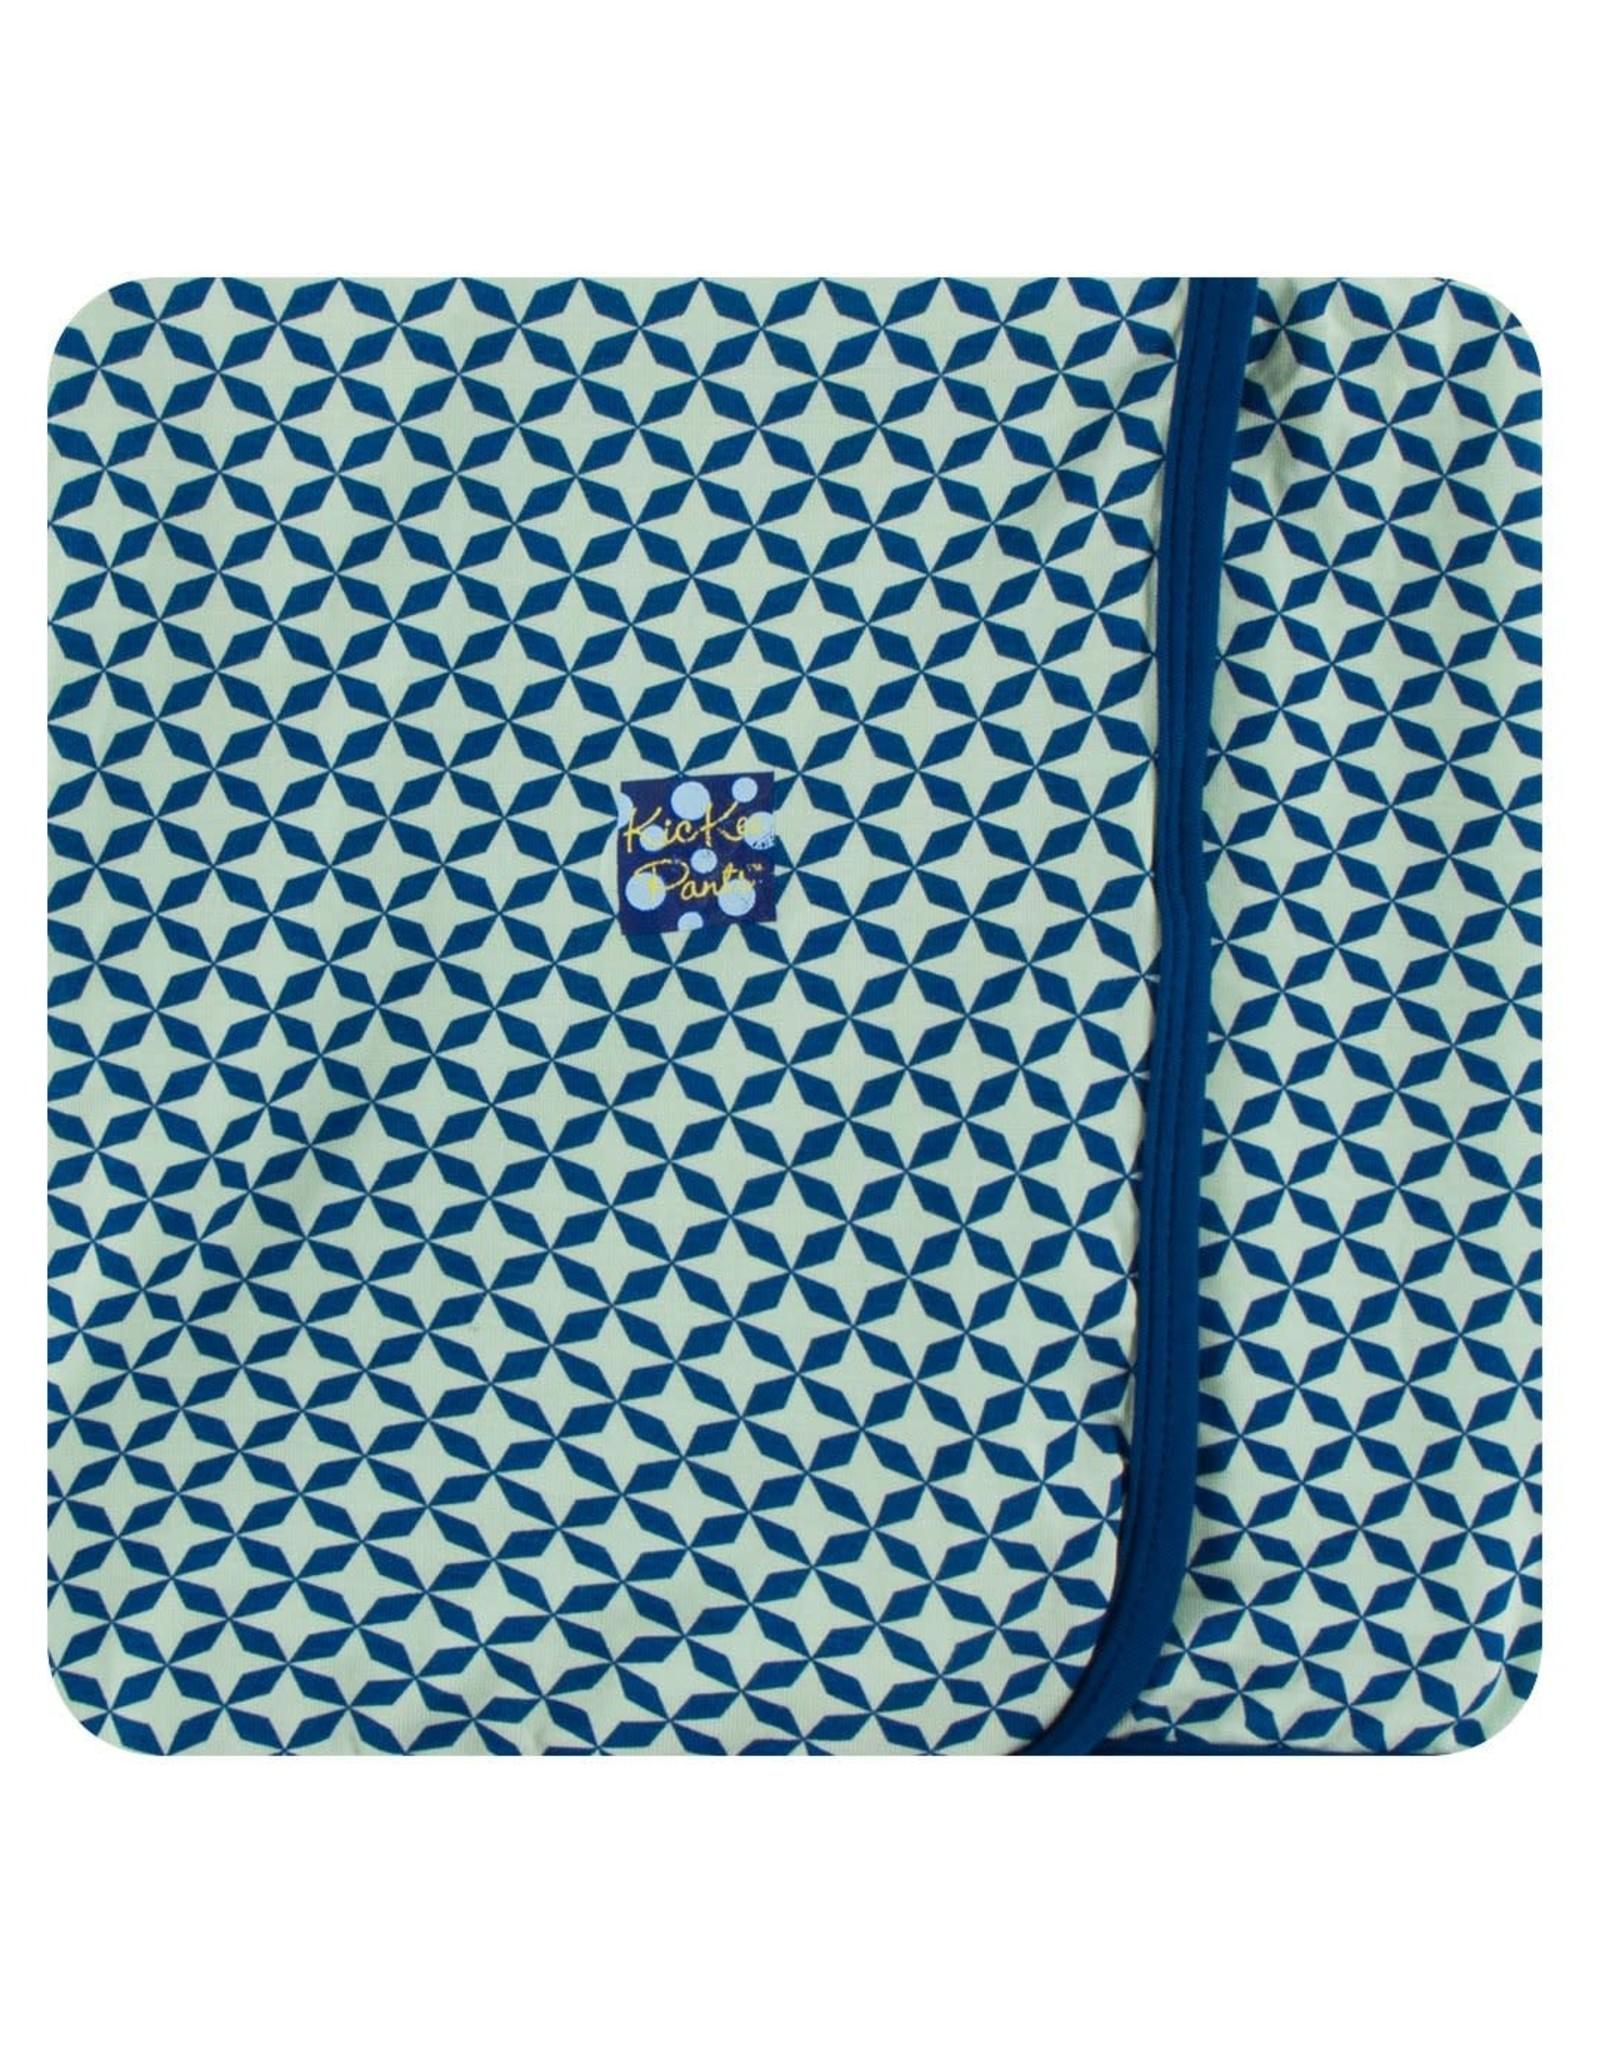 KicKee Pants Kickee Pants Swaddling Blanket, Pistachio Taj Mahal